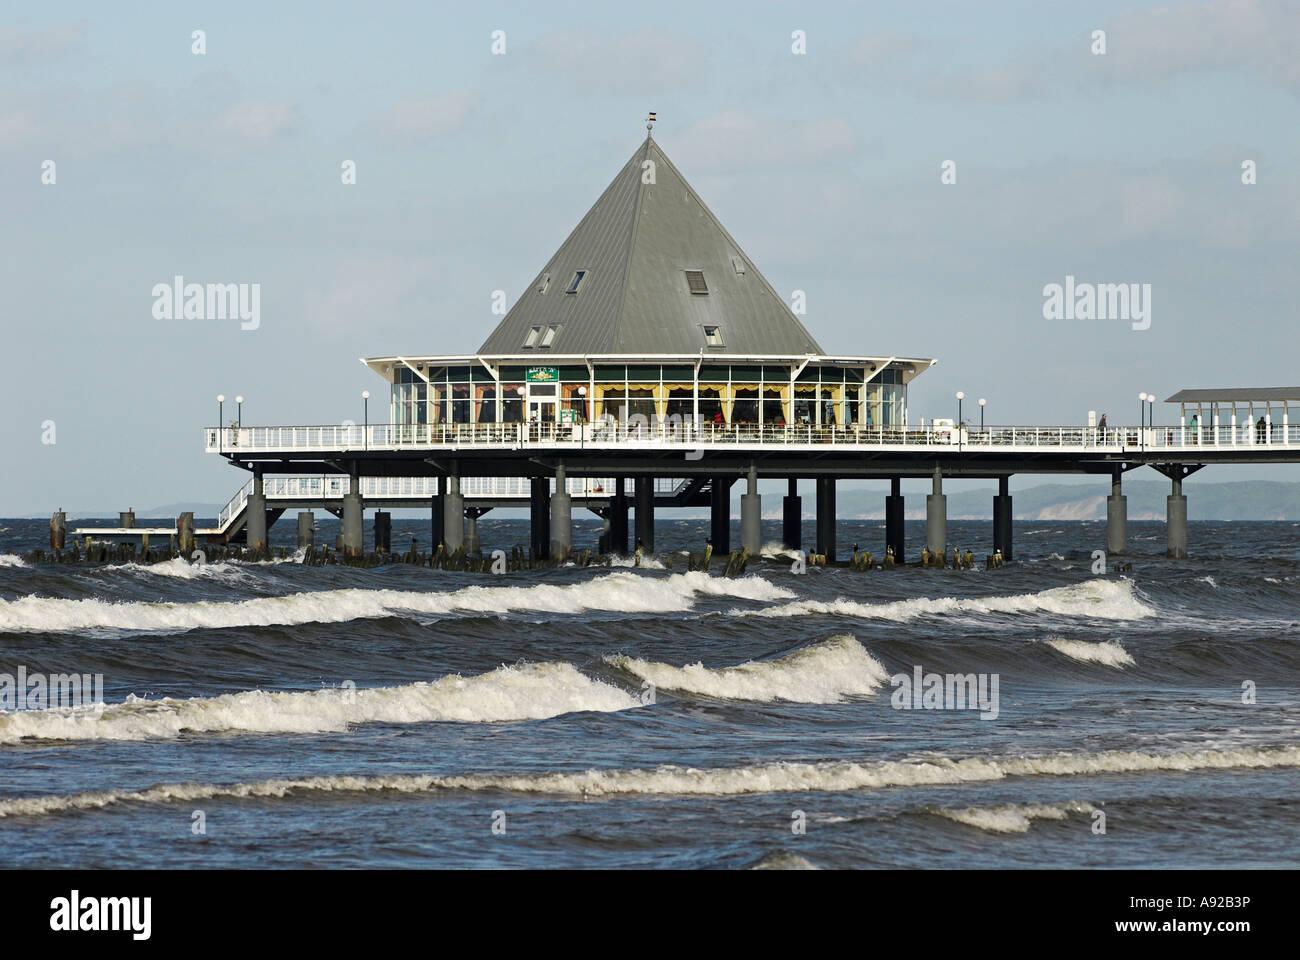 Pier at sea at Heringsdorf, Usedom island, Mecklenburg Western Pomerania, Germany, Europe Stock Photo